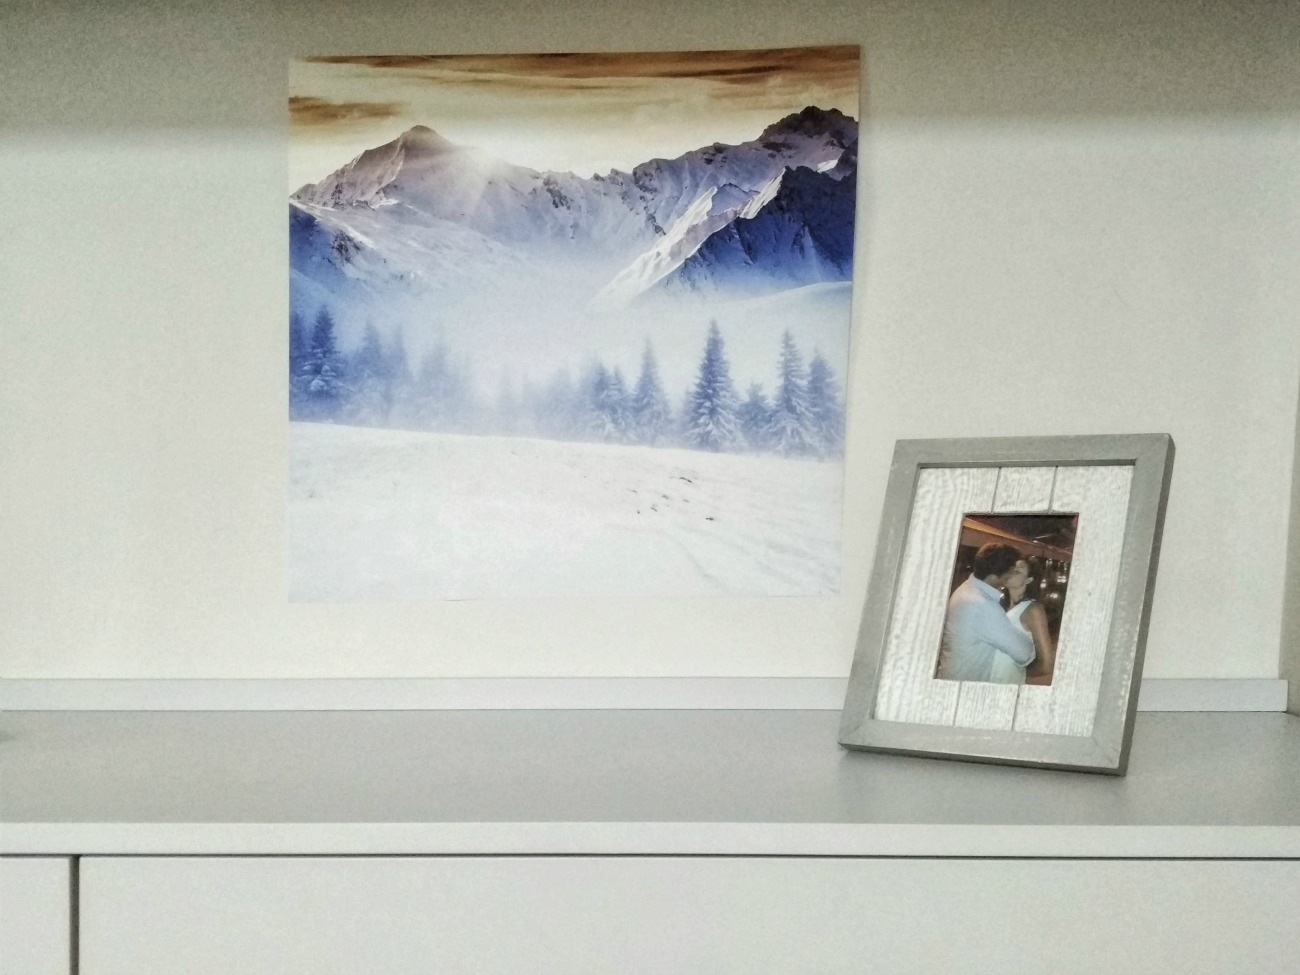 Carta da parati: mood invernale per le pareti di casa - easyrelooking